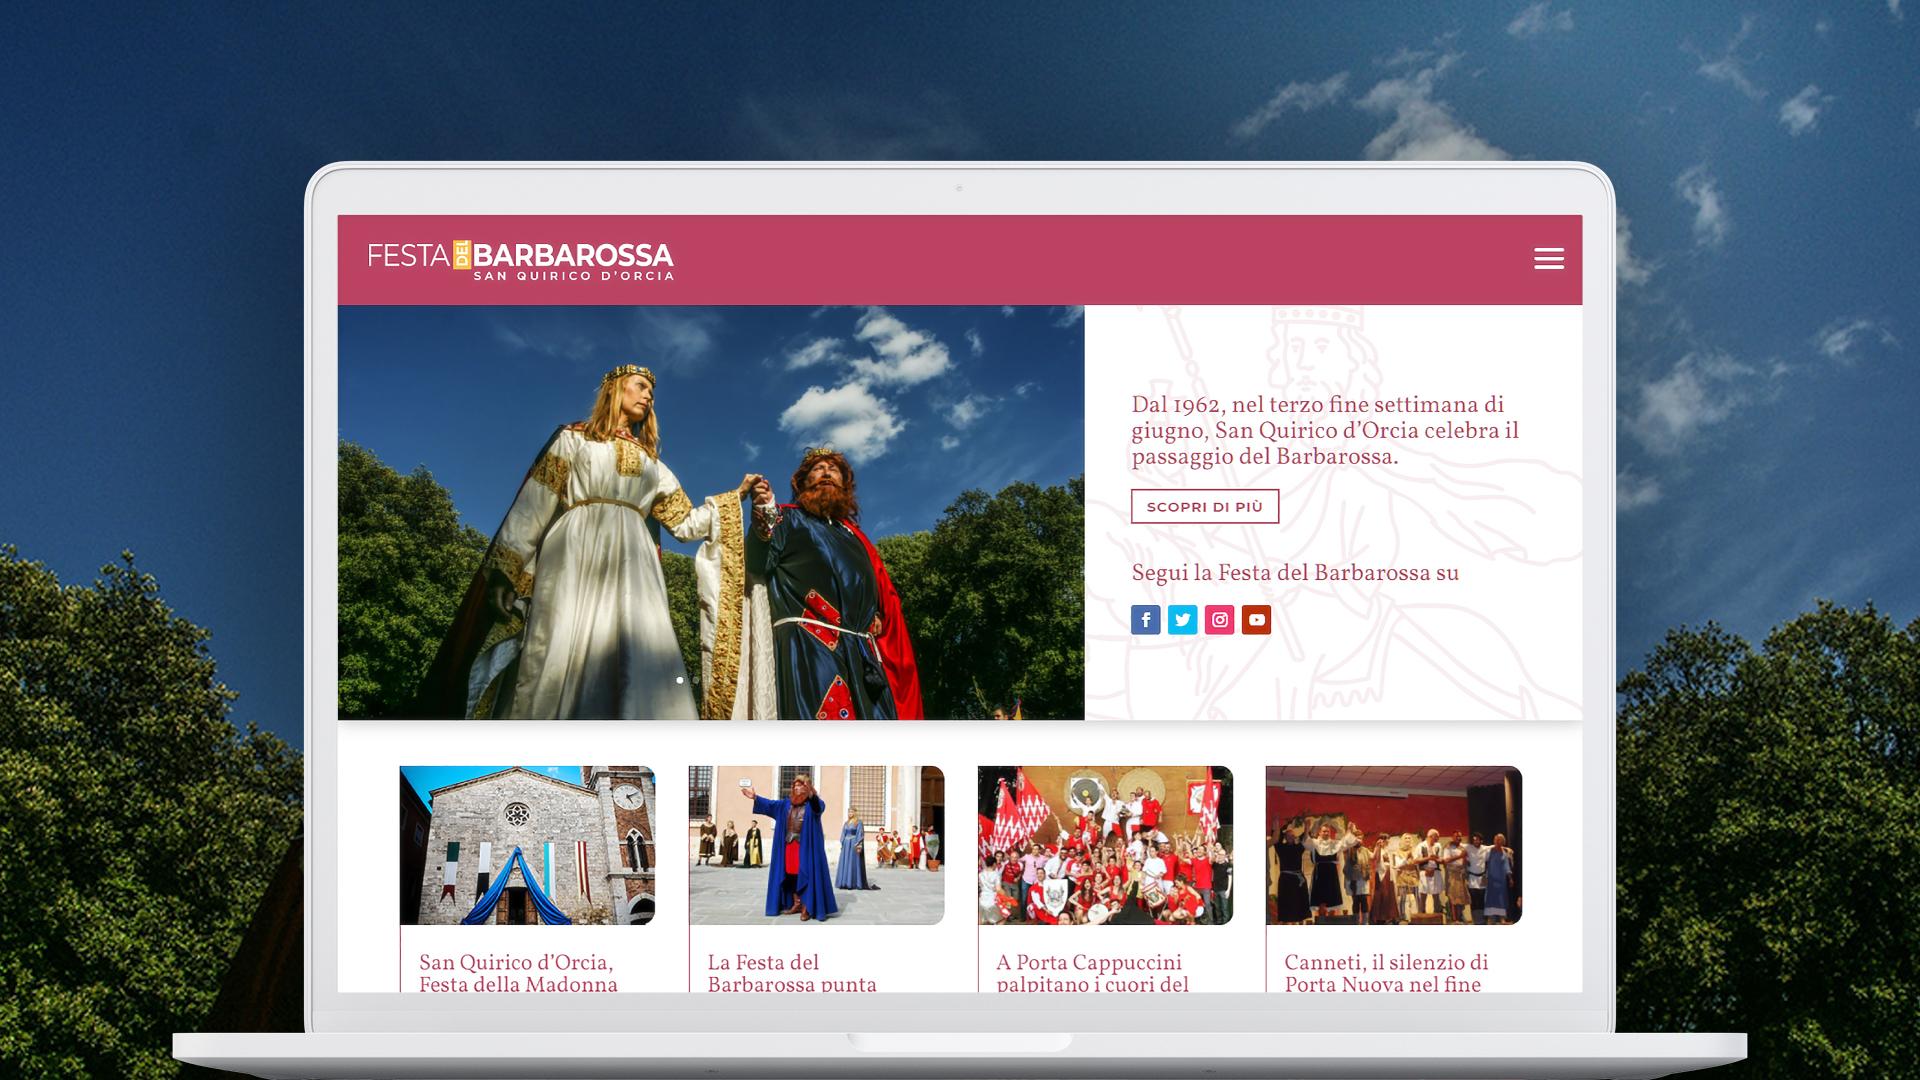 Festa del Barbarossa